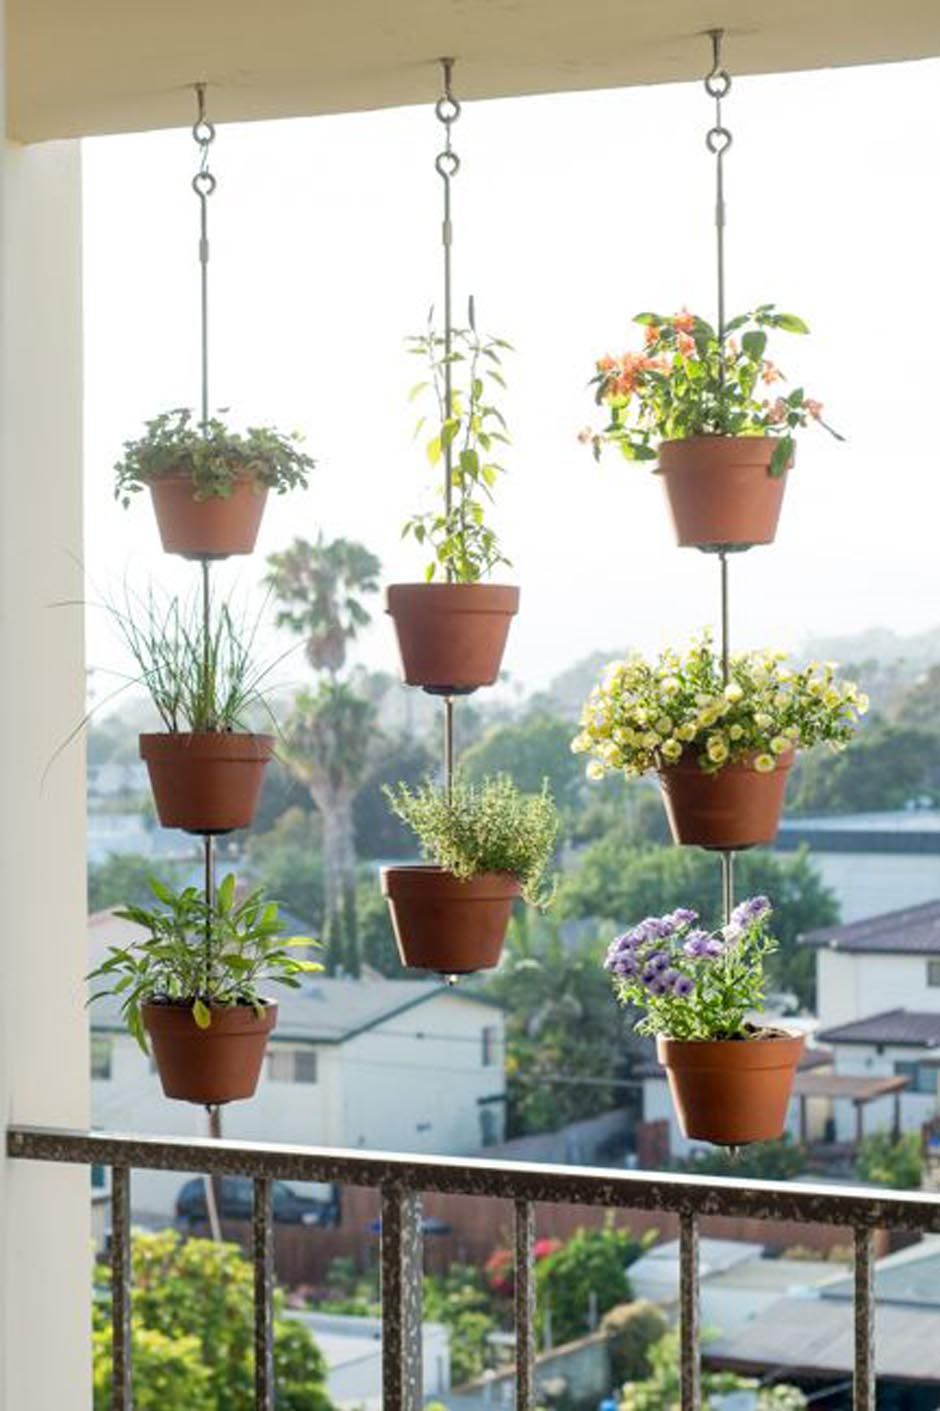 Plant Stand Diy Diyplantstand Diy Outdoor Plant Stand Ideas Apartment Garden Small Space Gardening Vertical Garden